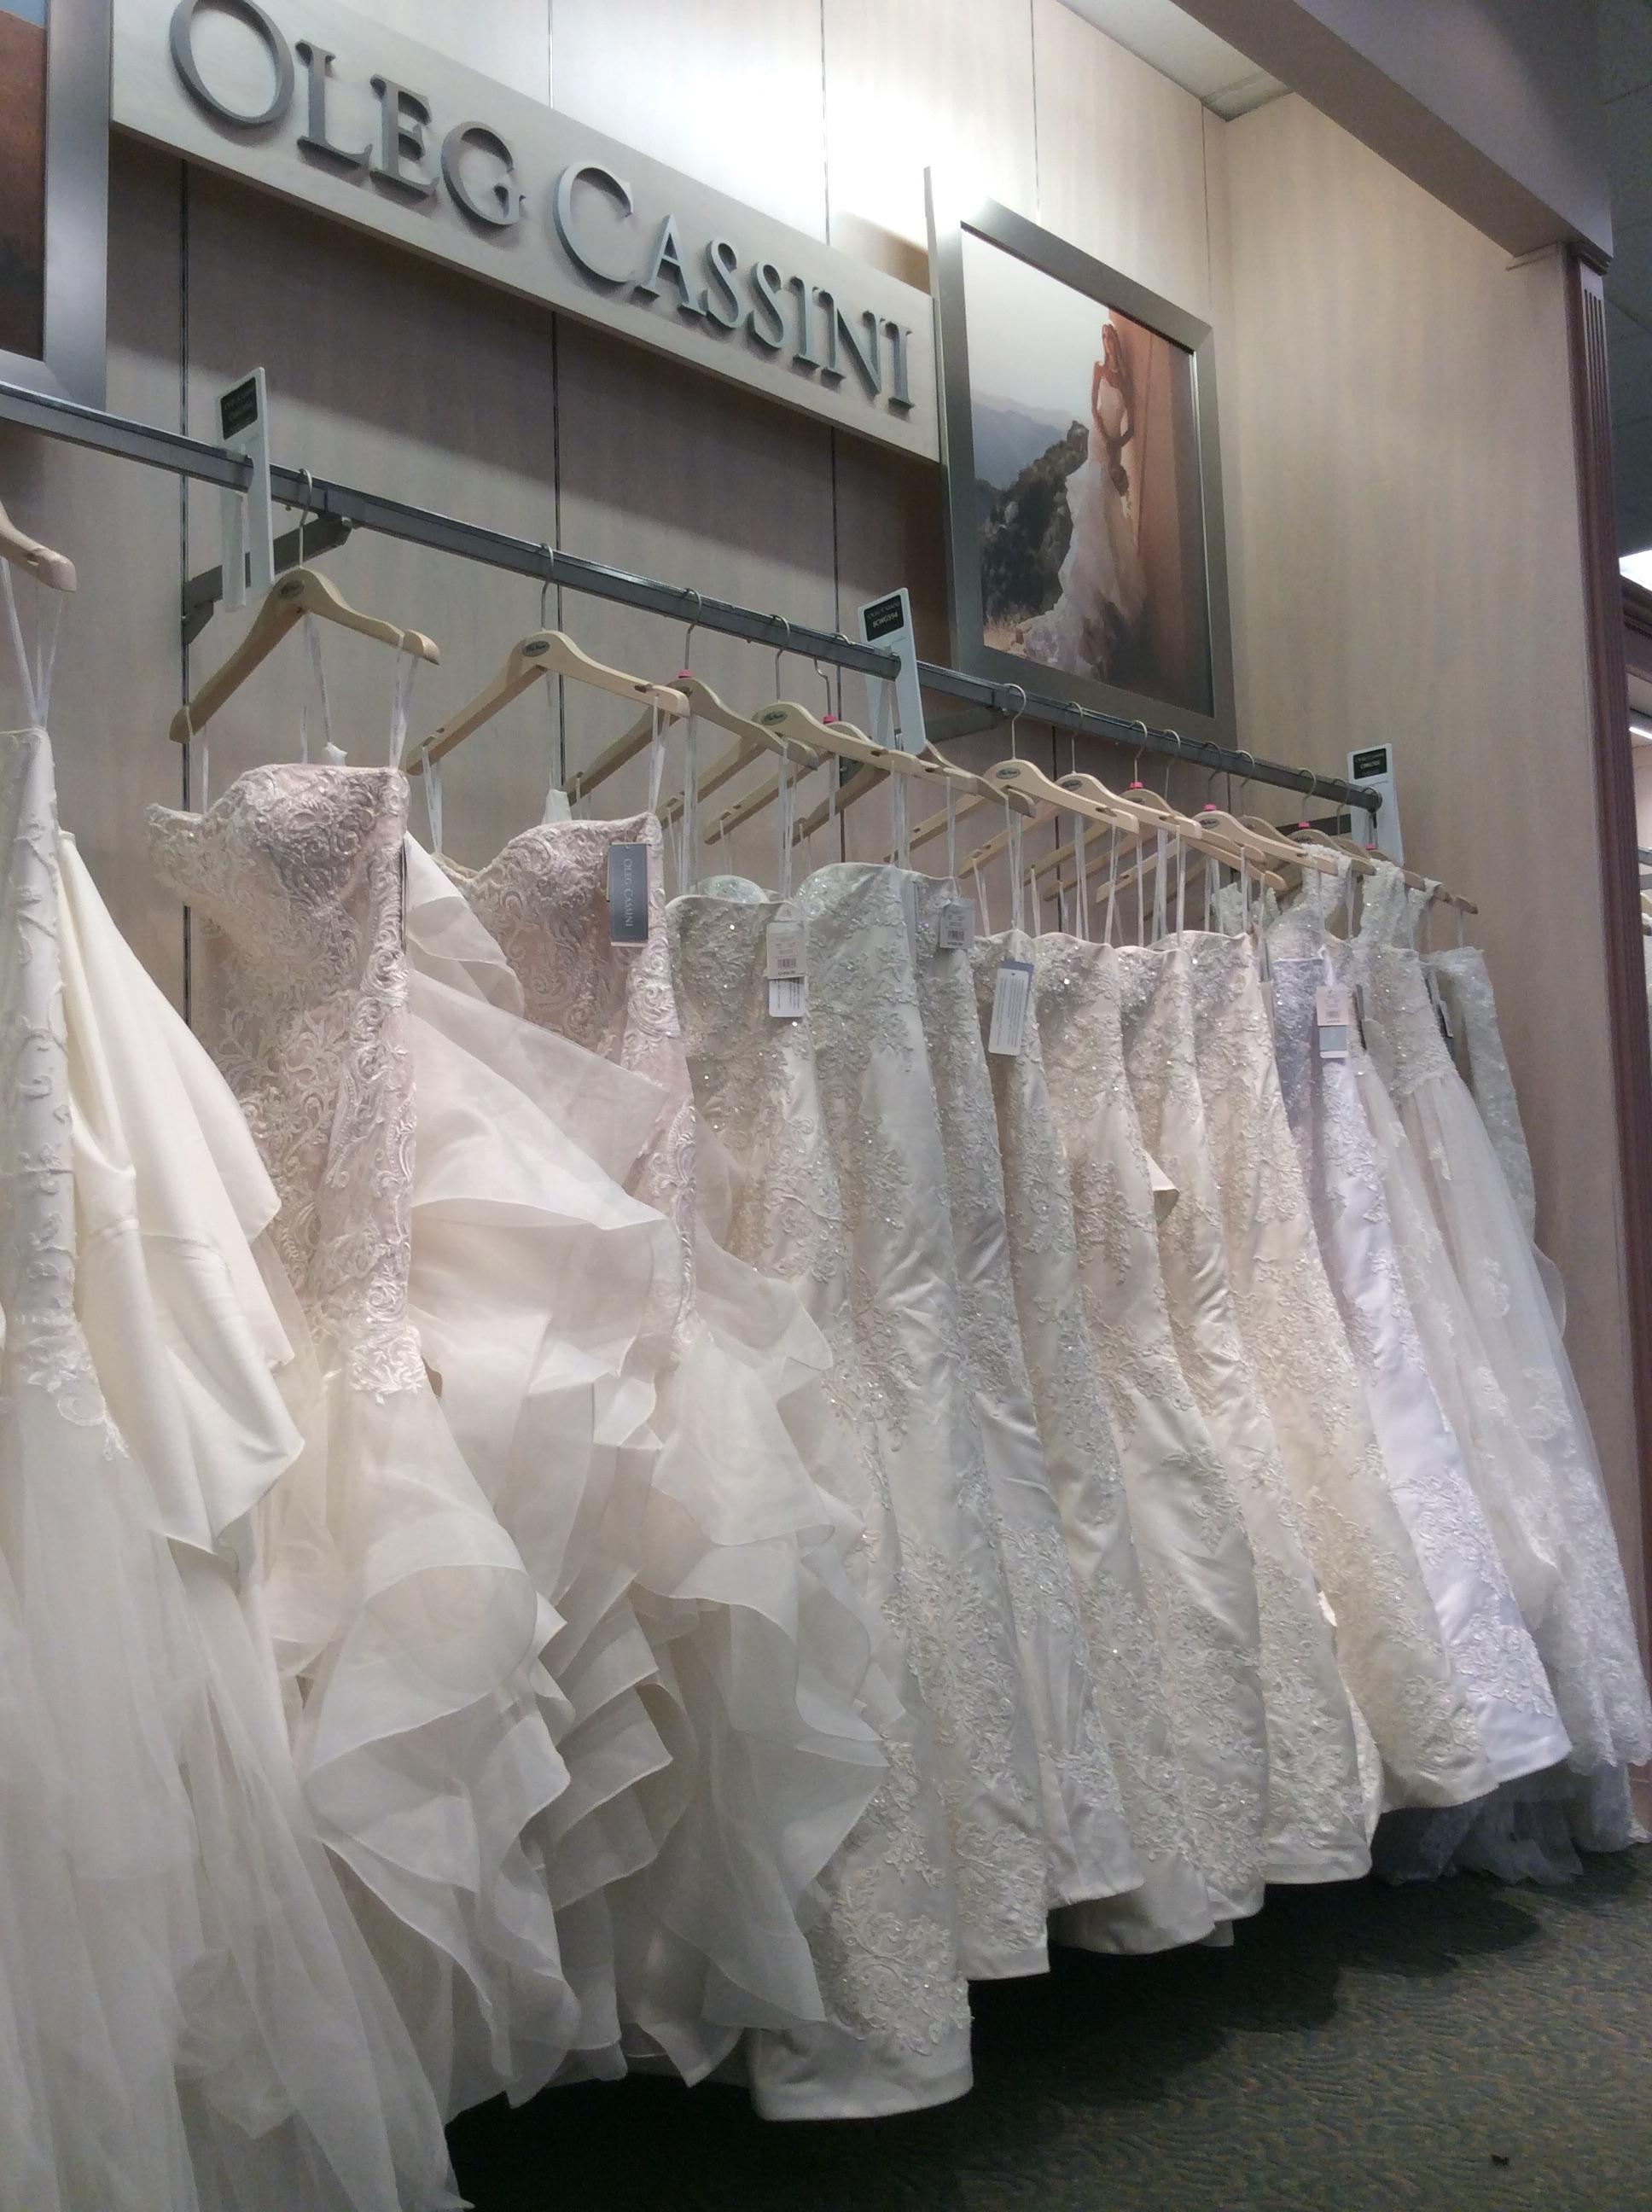 David's Bridal 2316 W Loop 340, Waco, TX